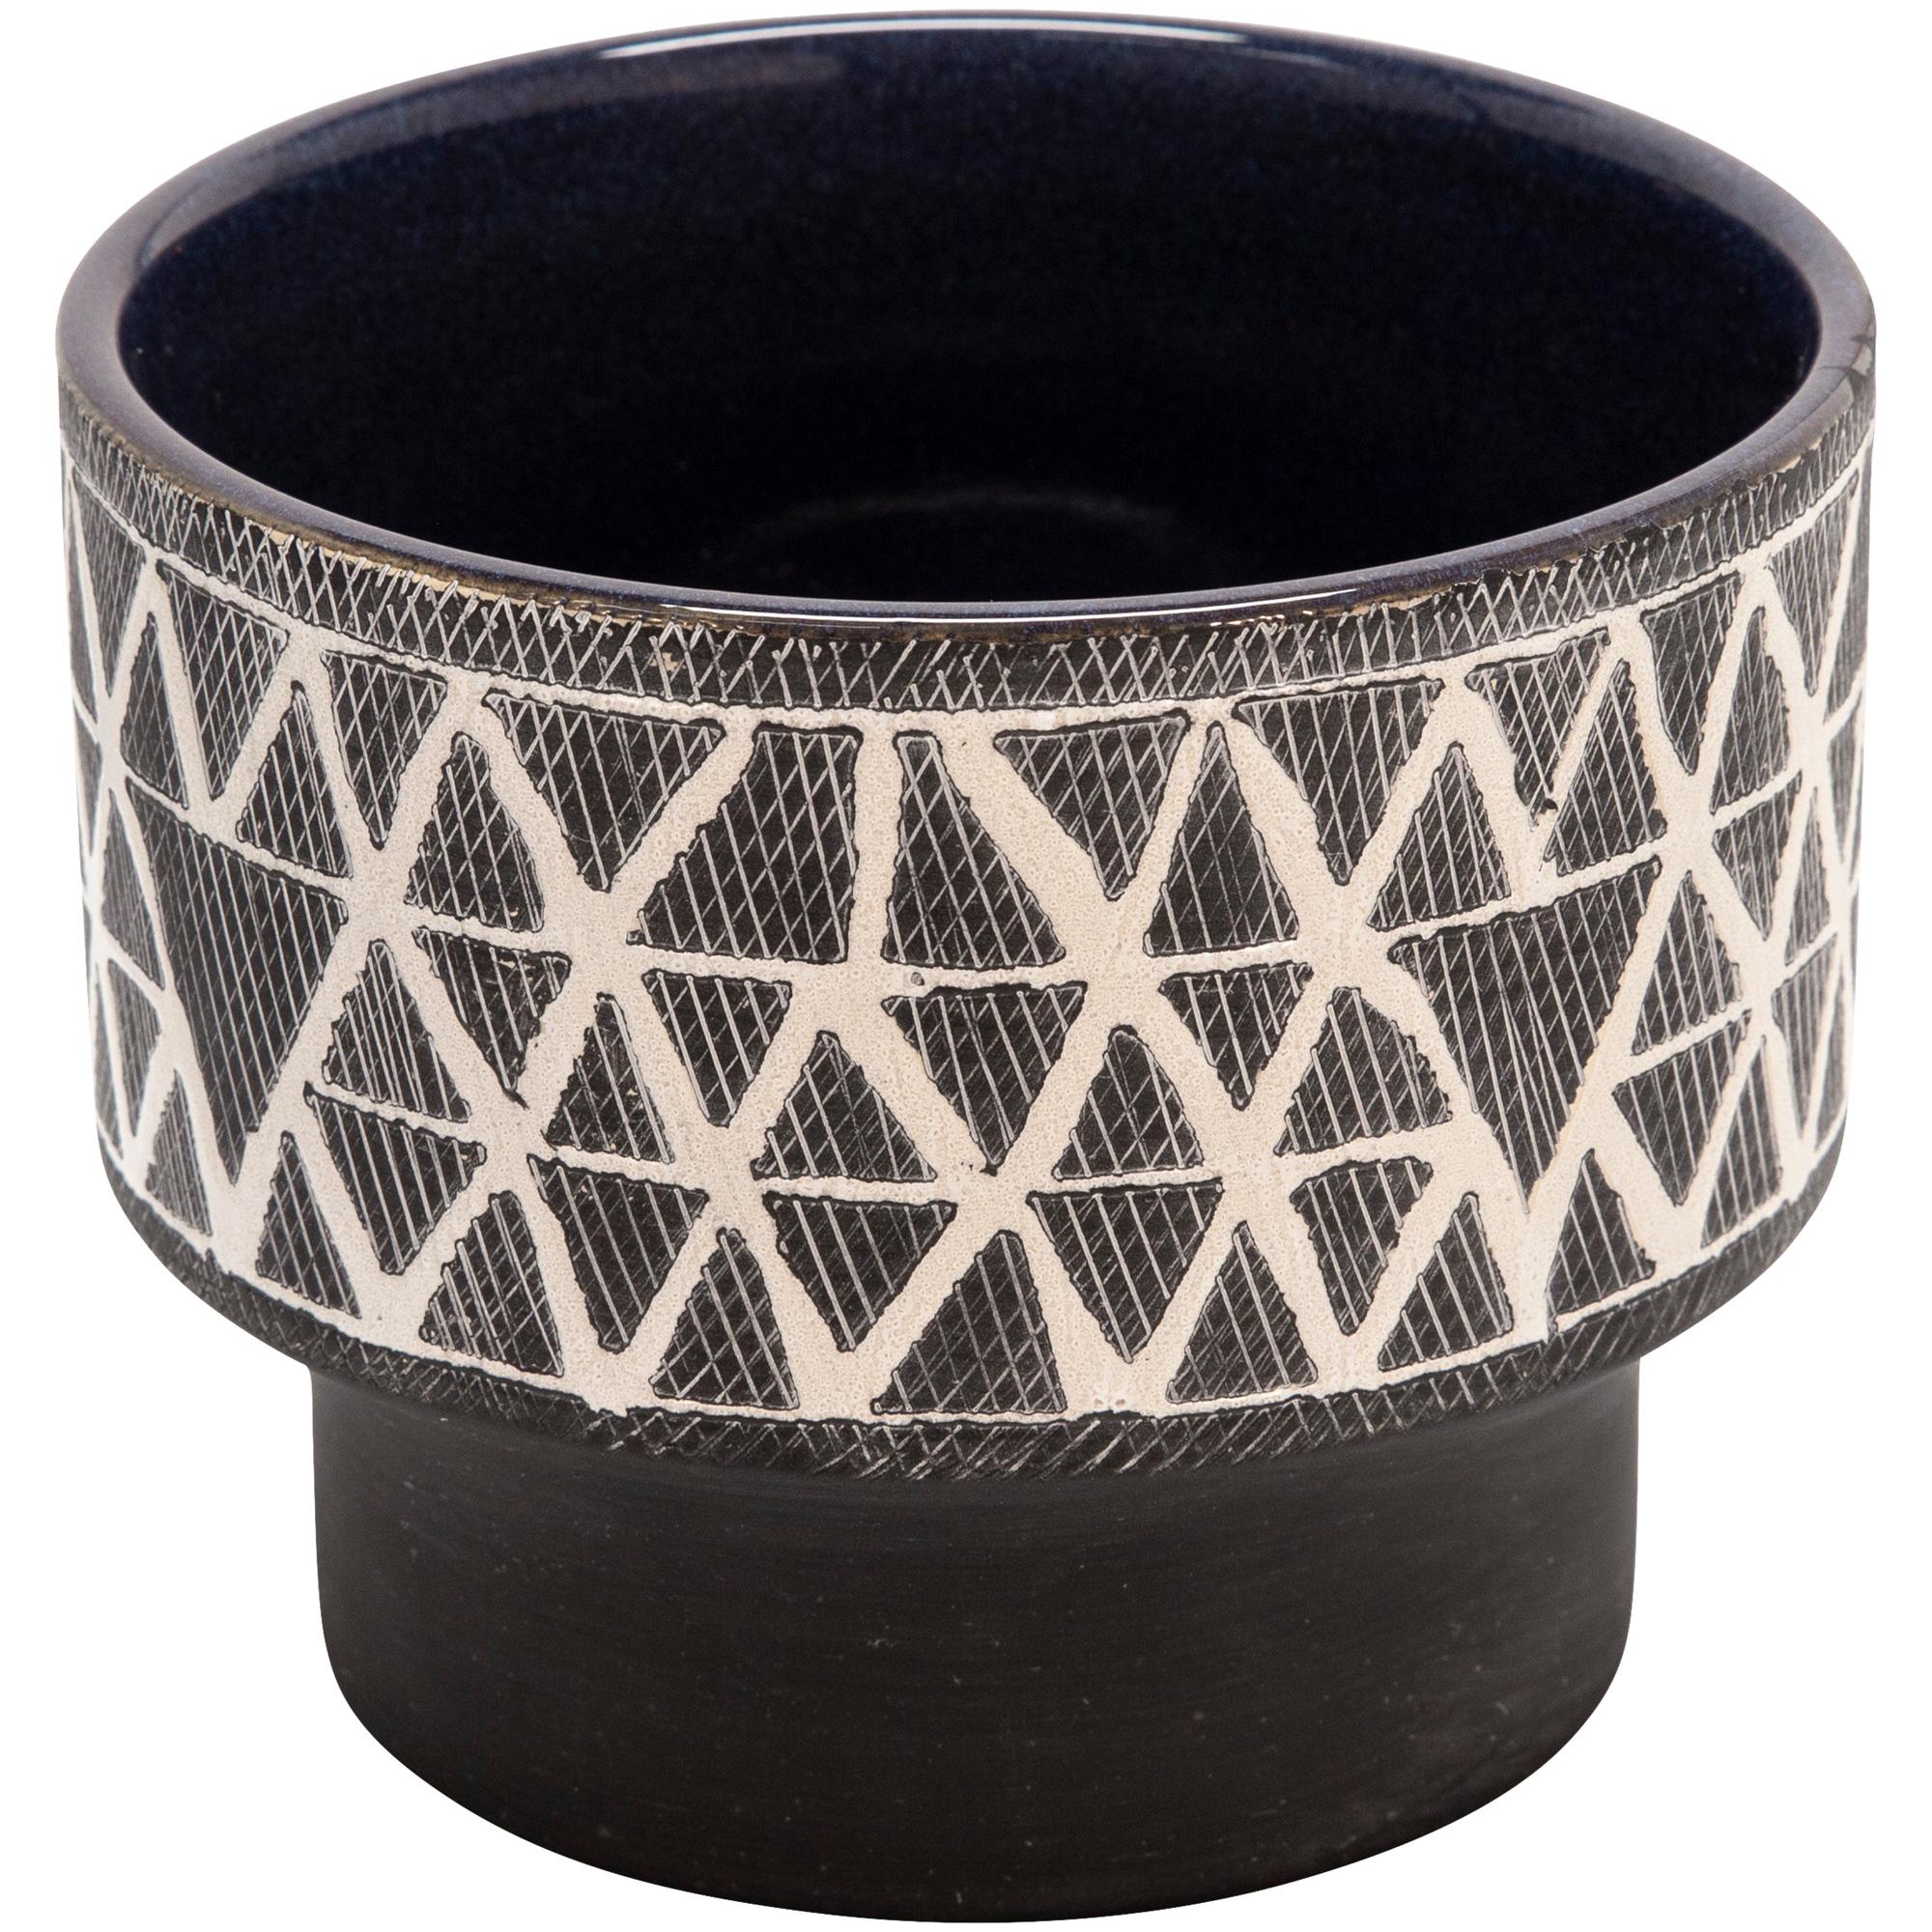 Sagebrook | Collected Culture Gray Ceramic Planter